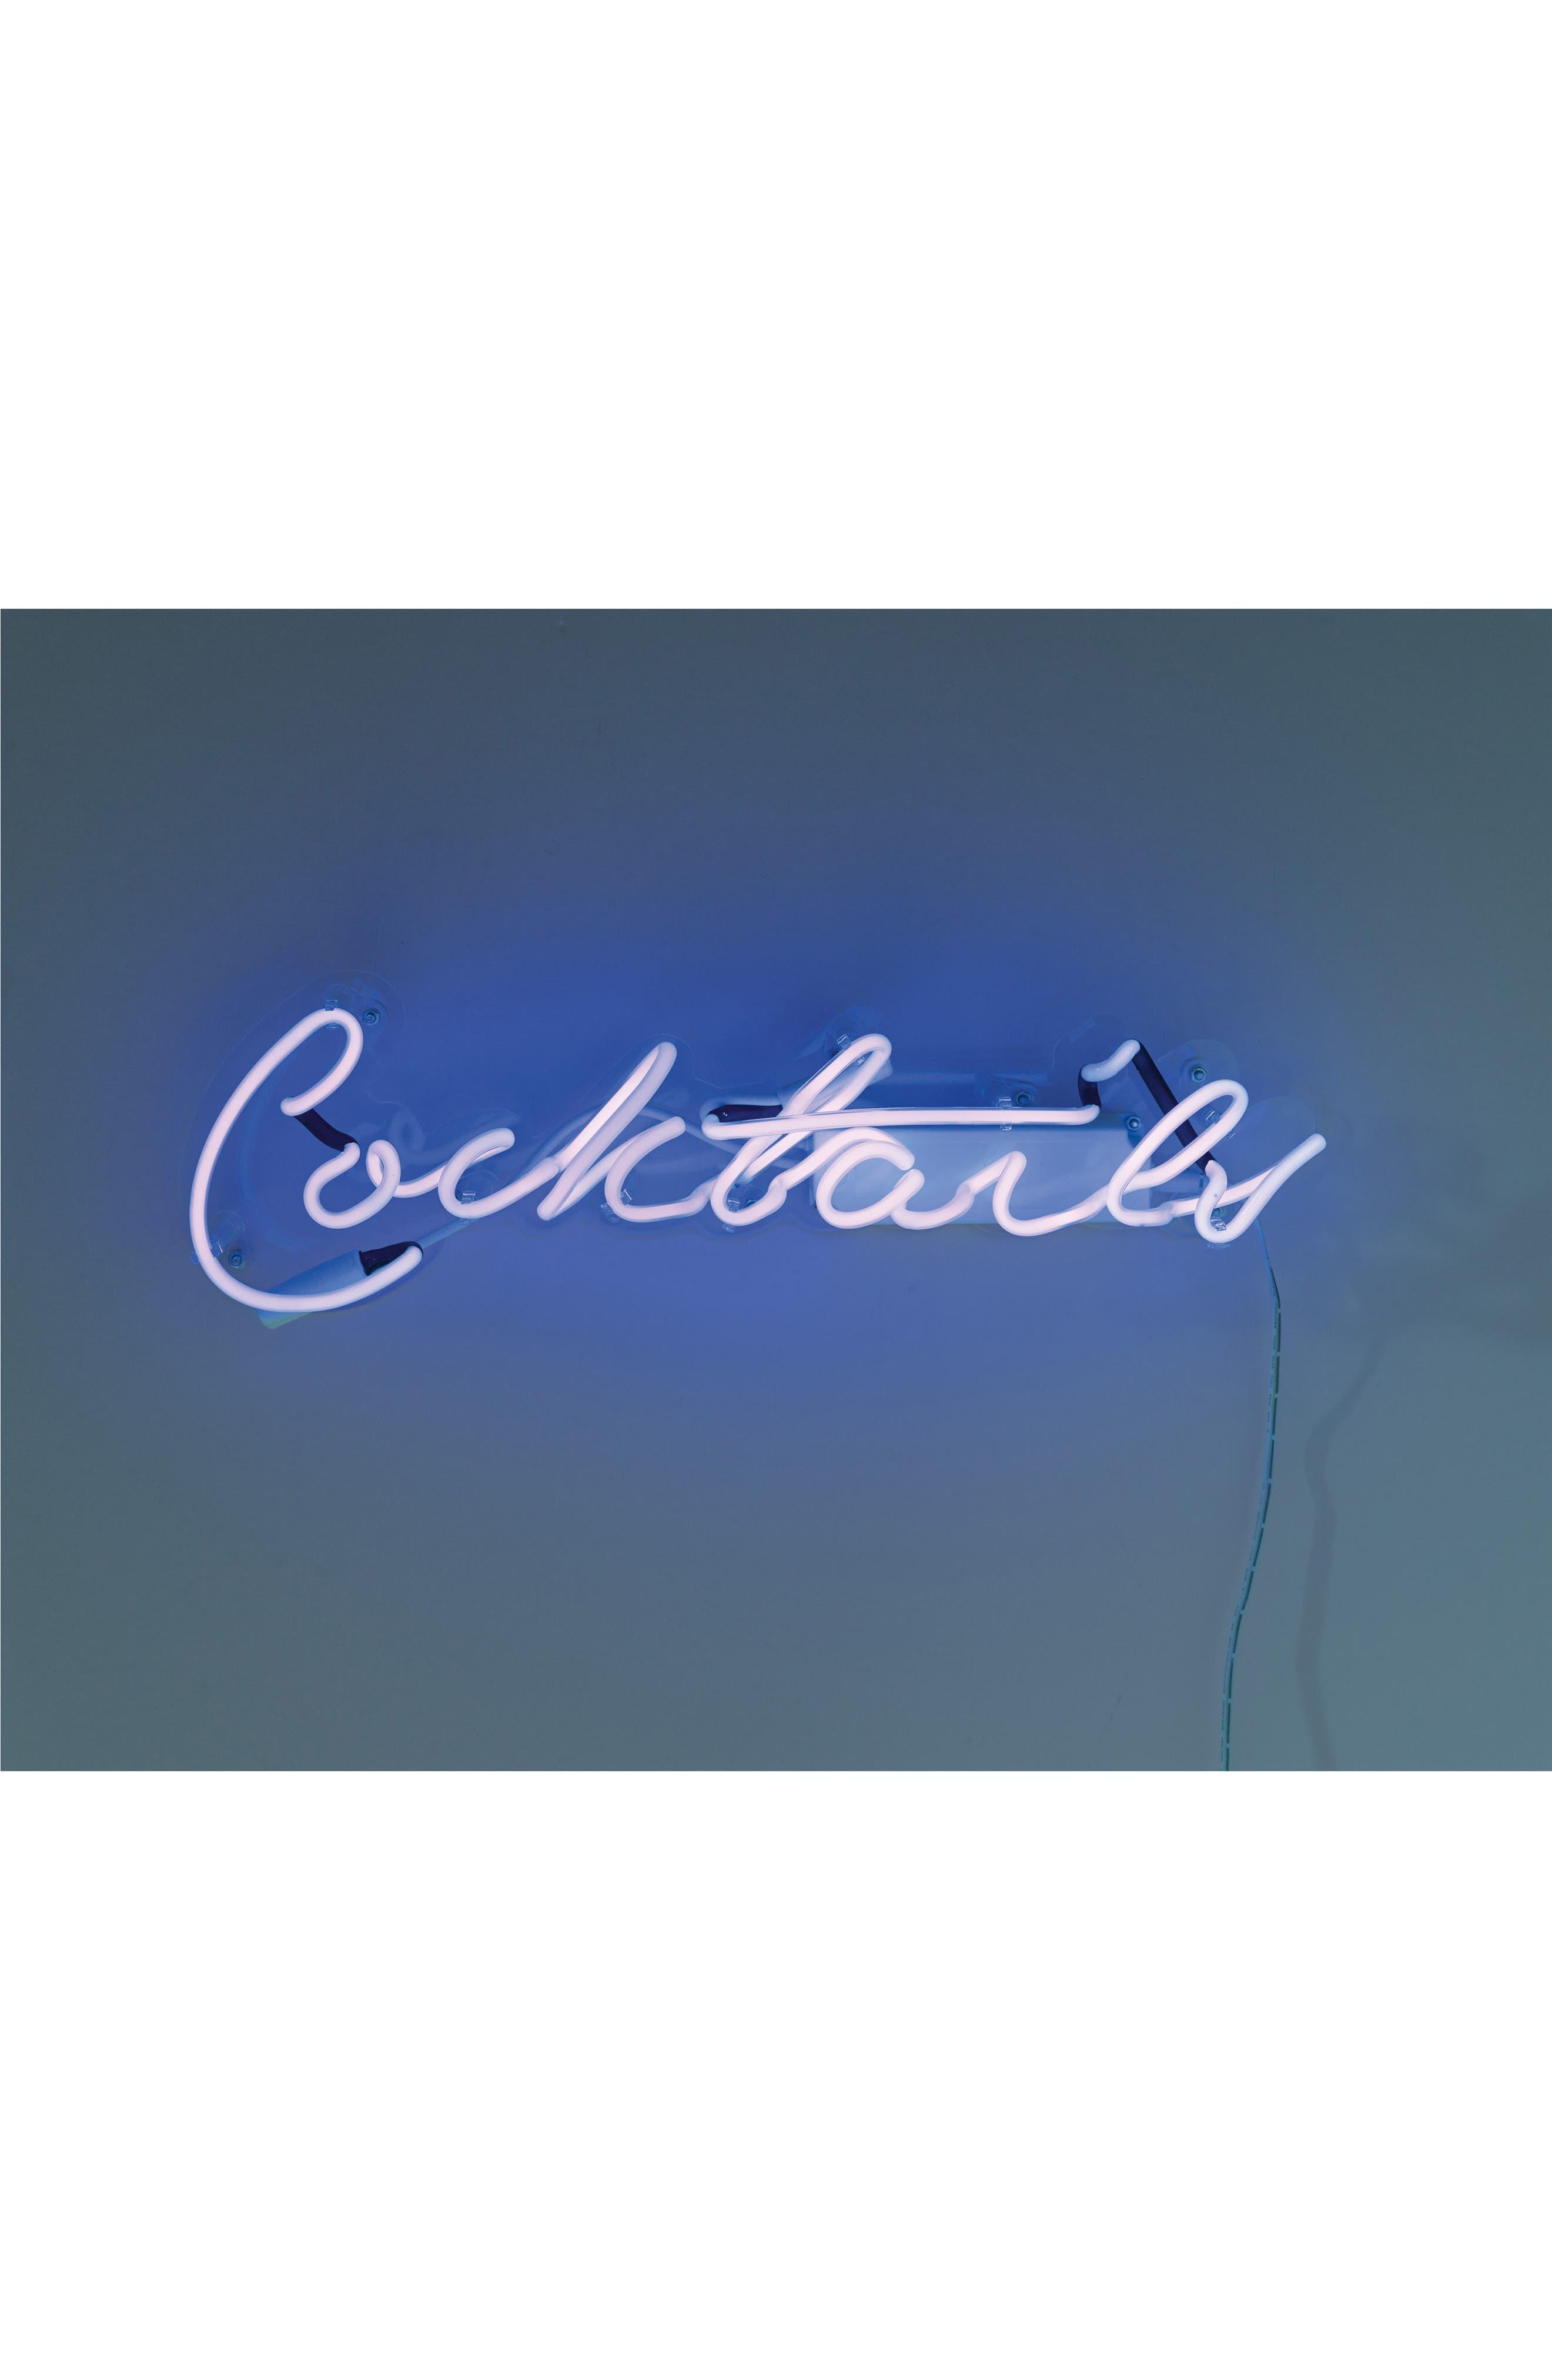 Cocktails Neon Light Wall Art,                             Main thumbnail 1, color,                             400